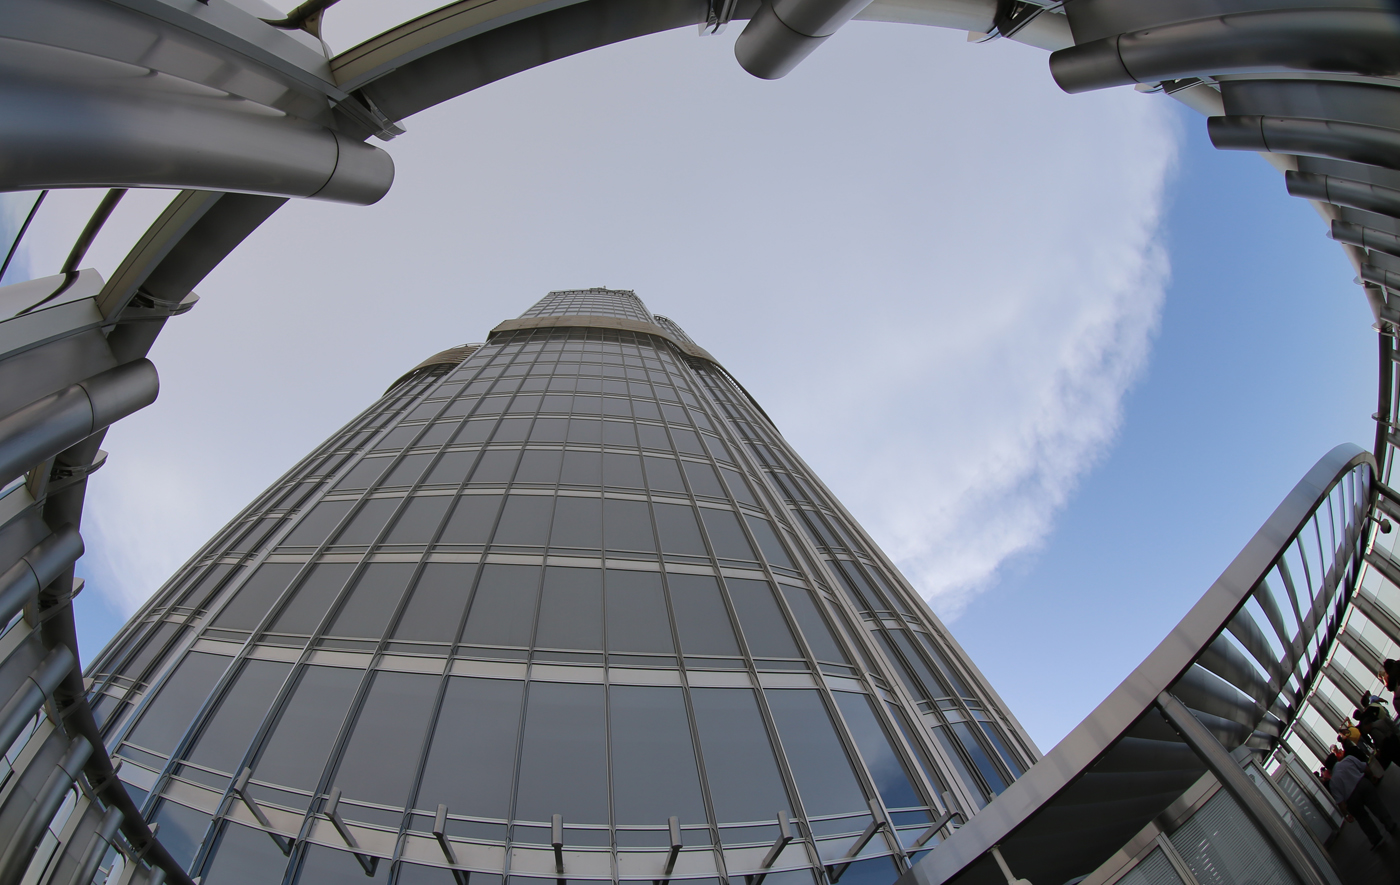 2722FEET BURJ KHALIFA IN SKY by Harvey Whittam.jpg